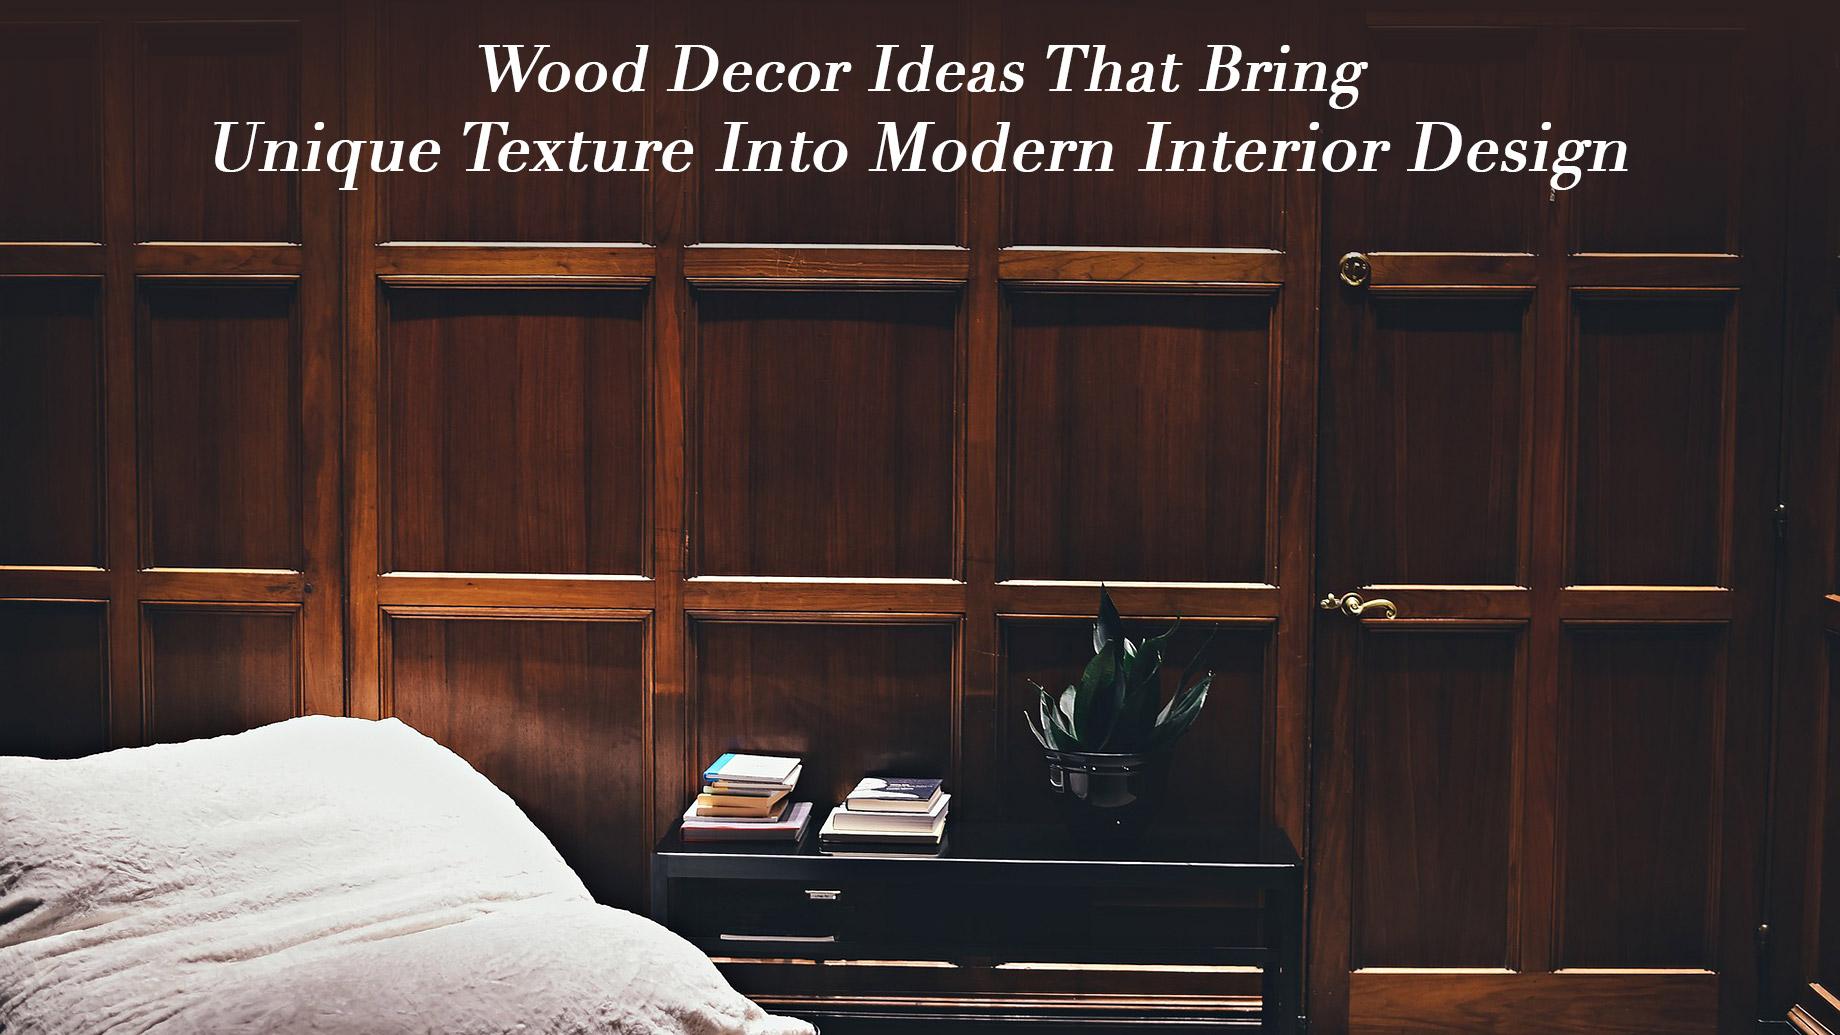 Wood Decor Ideas That Bring Unique Texture Into Modern Interior Design